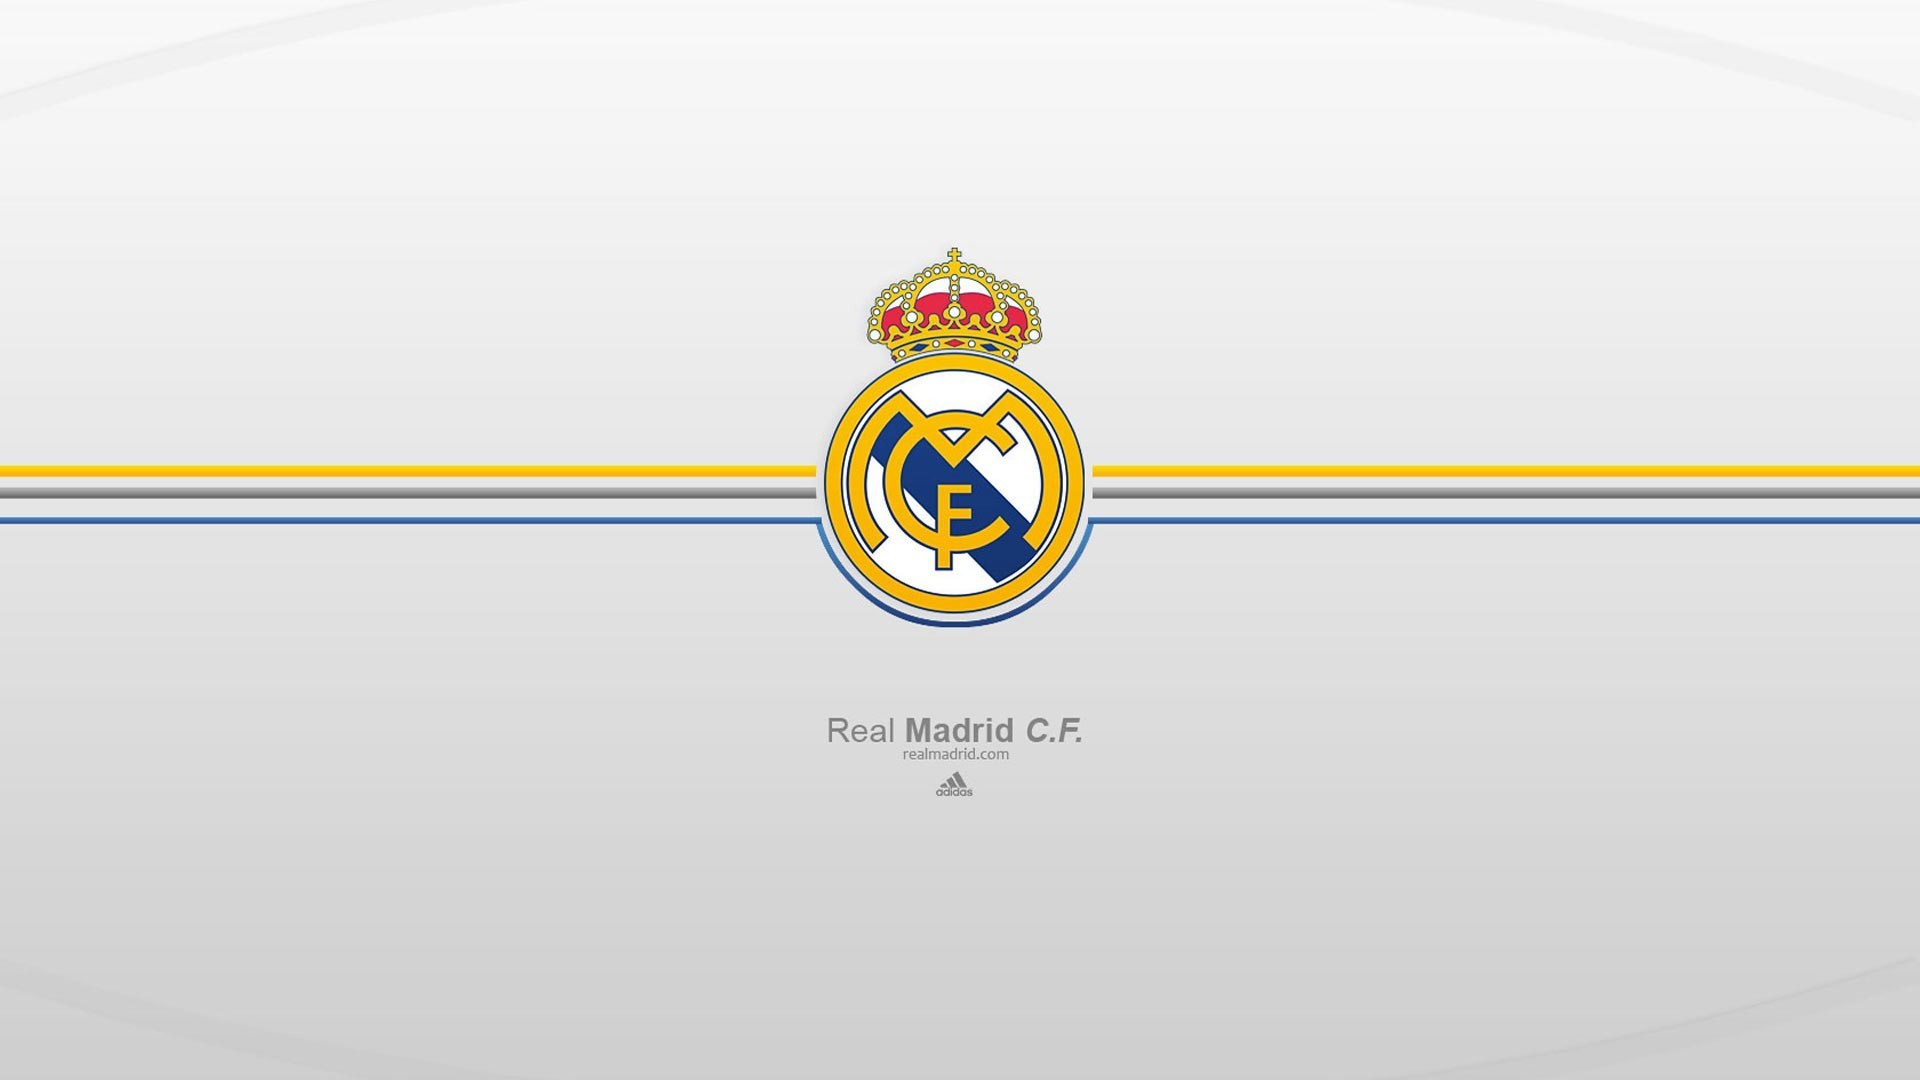 Res: 1920x1080, Real Madrid CF wallpaper